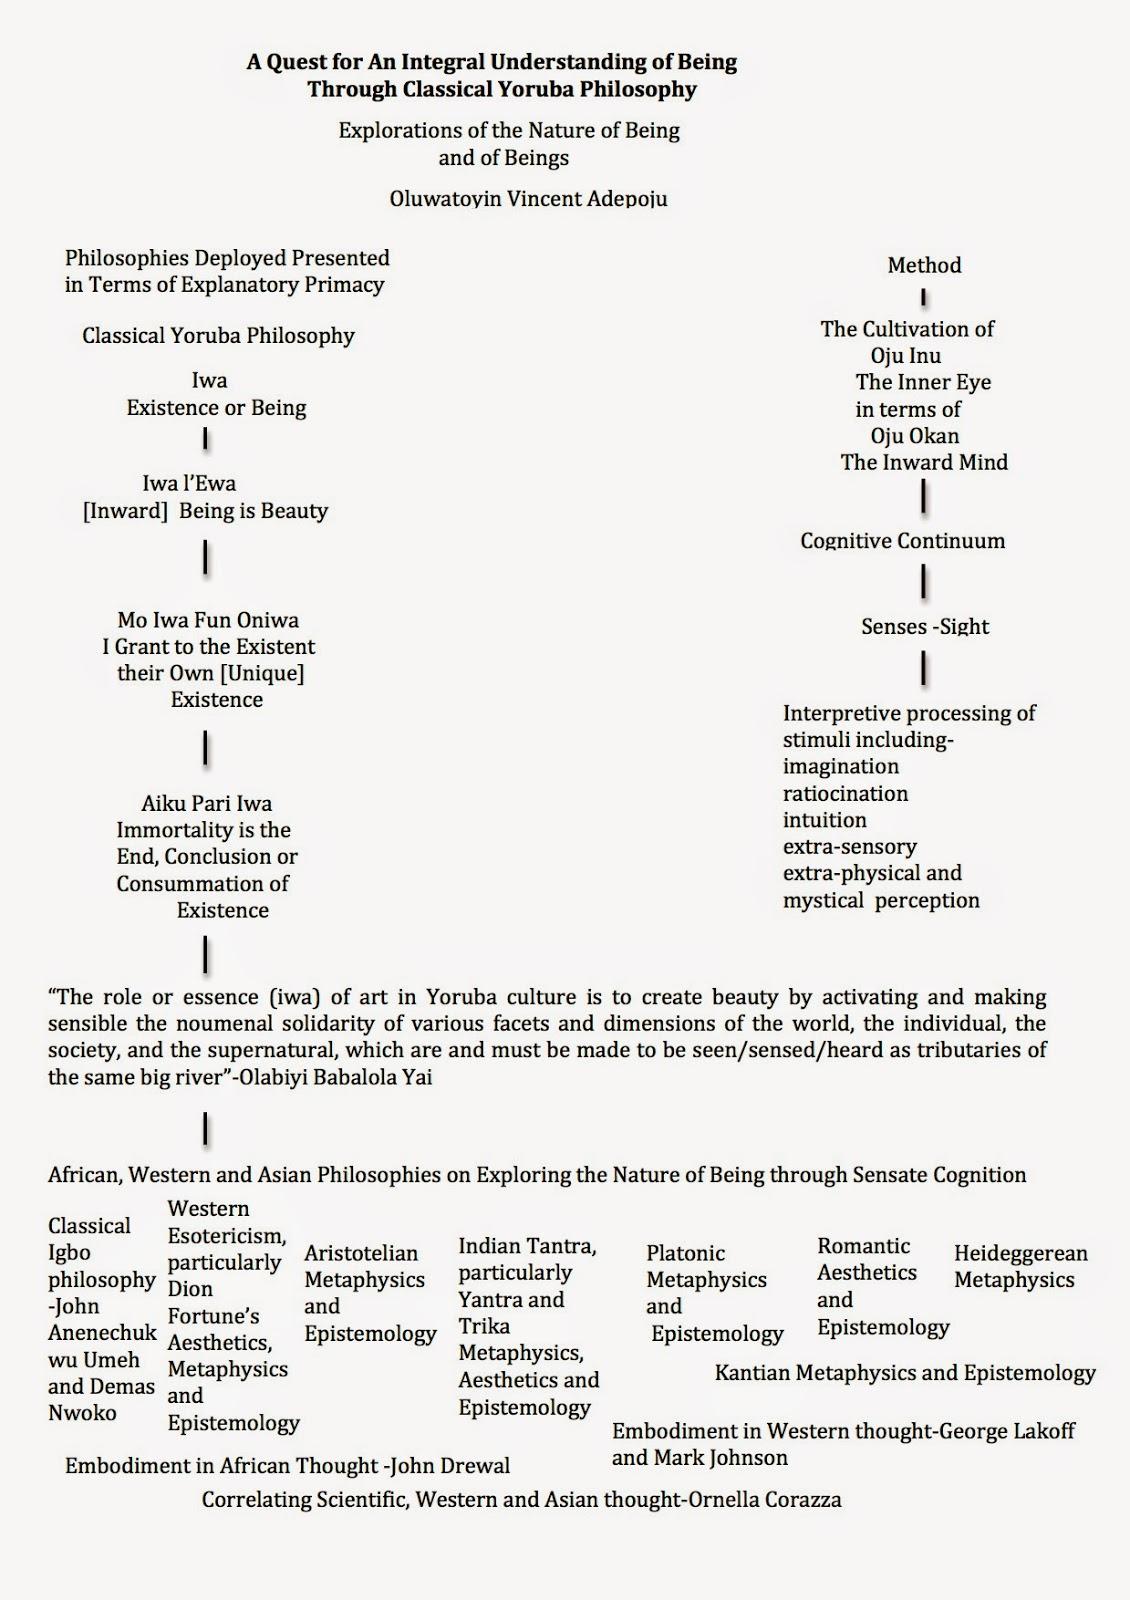 leibniz new essays concerning human understanding pdf an essay hd image of new essays concerning human understanding leibniz pdf